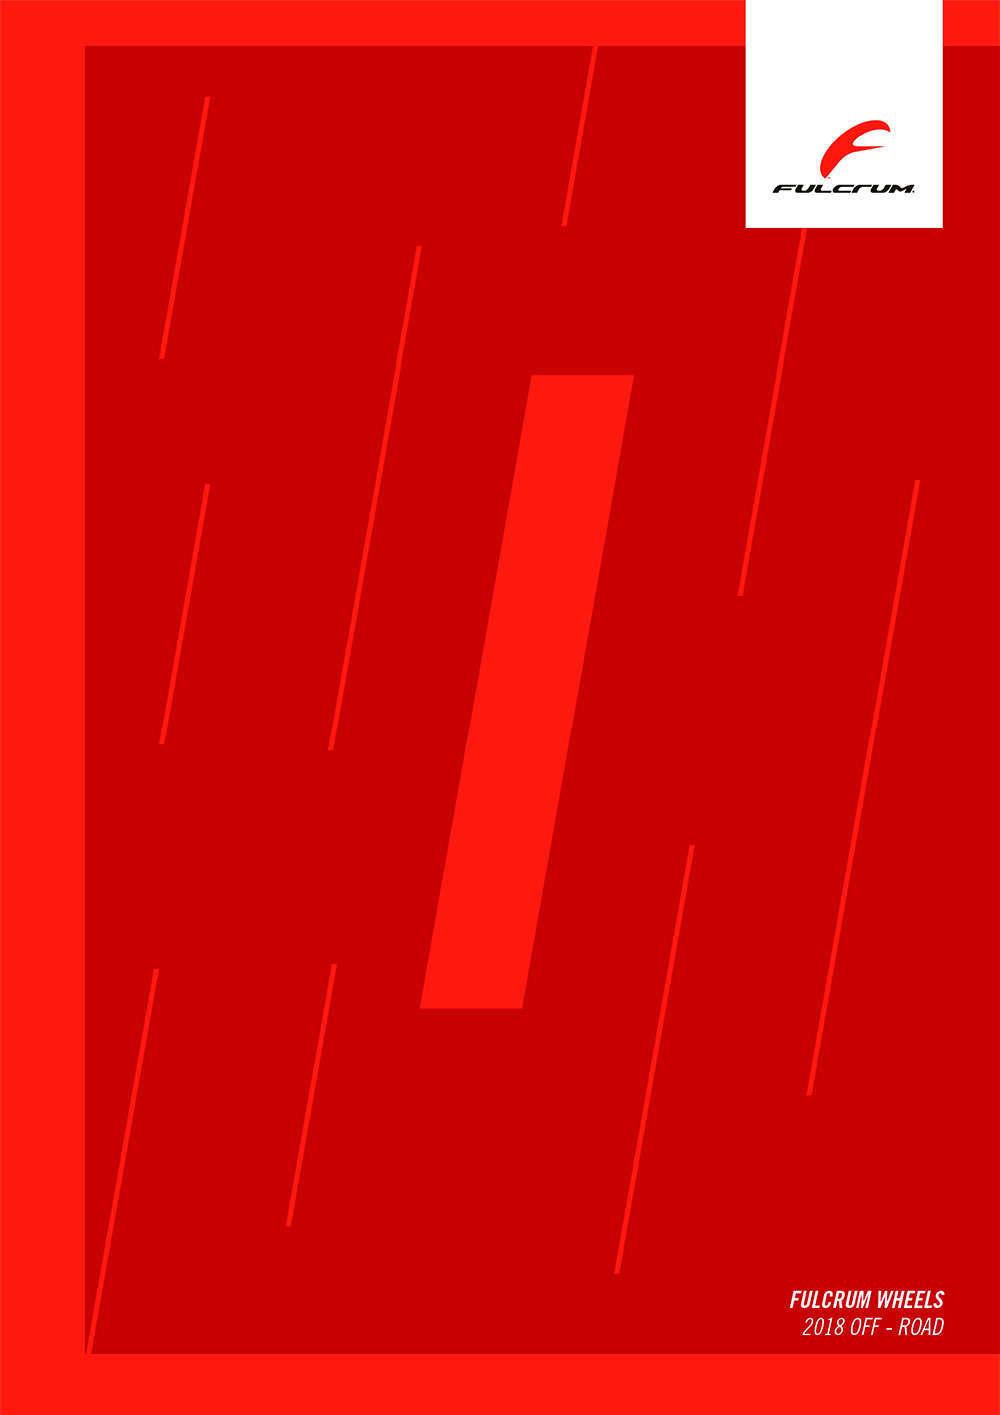 Catálogo de Fulcrum 2018. Toda la gama de ruedas Fulcrum para la temporada 2018